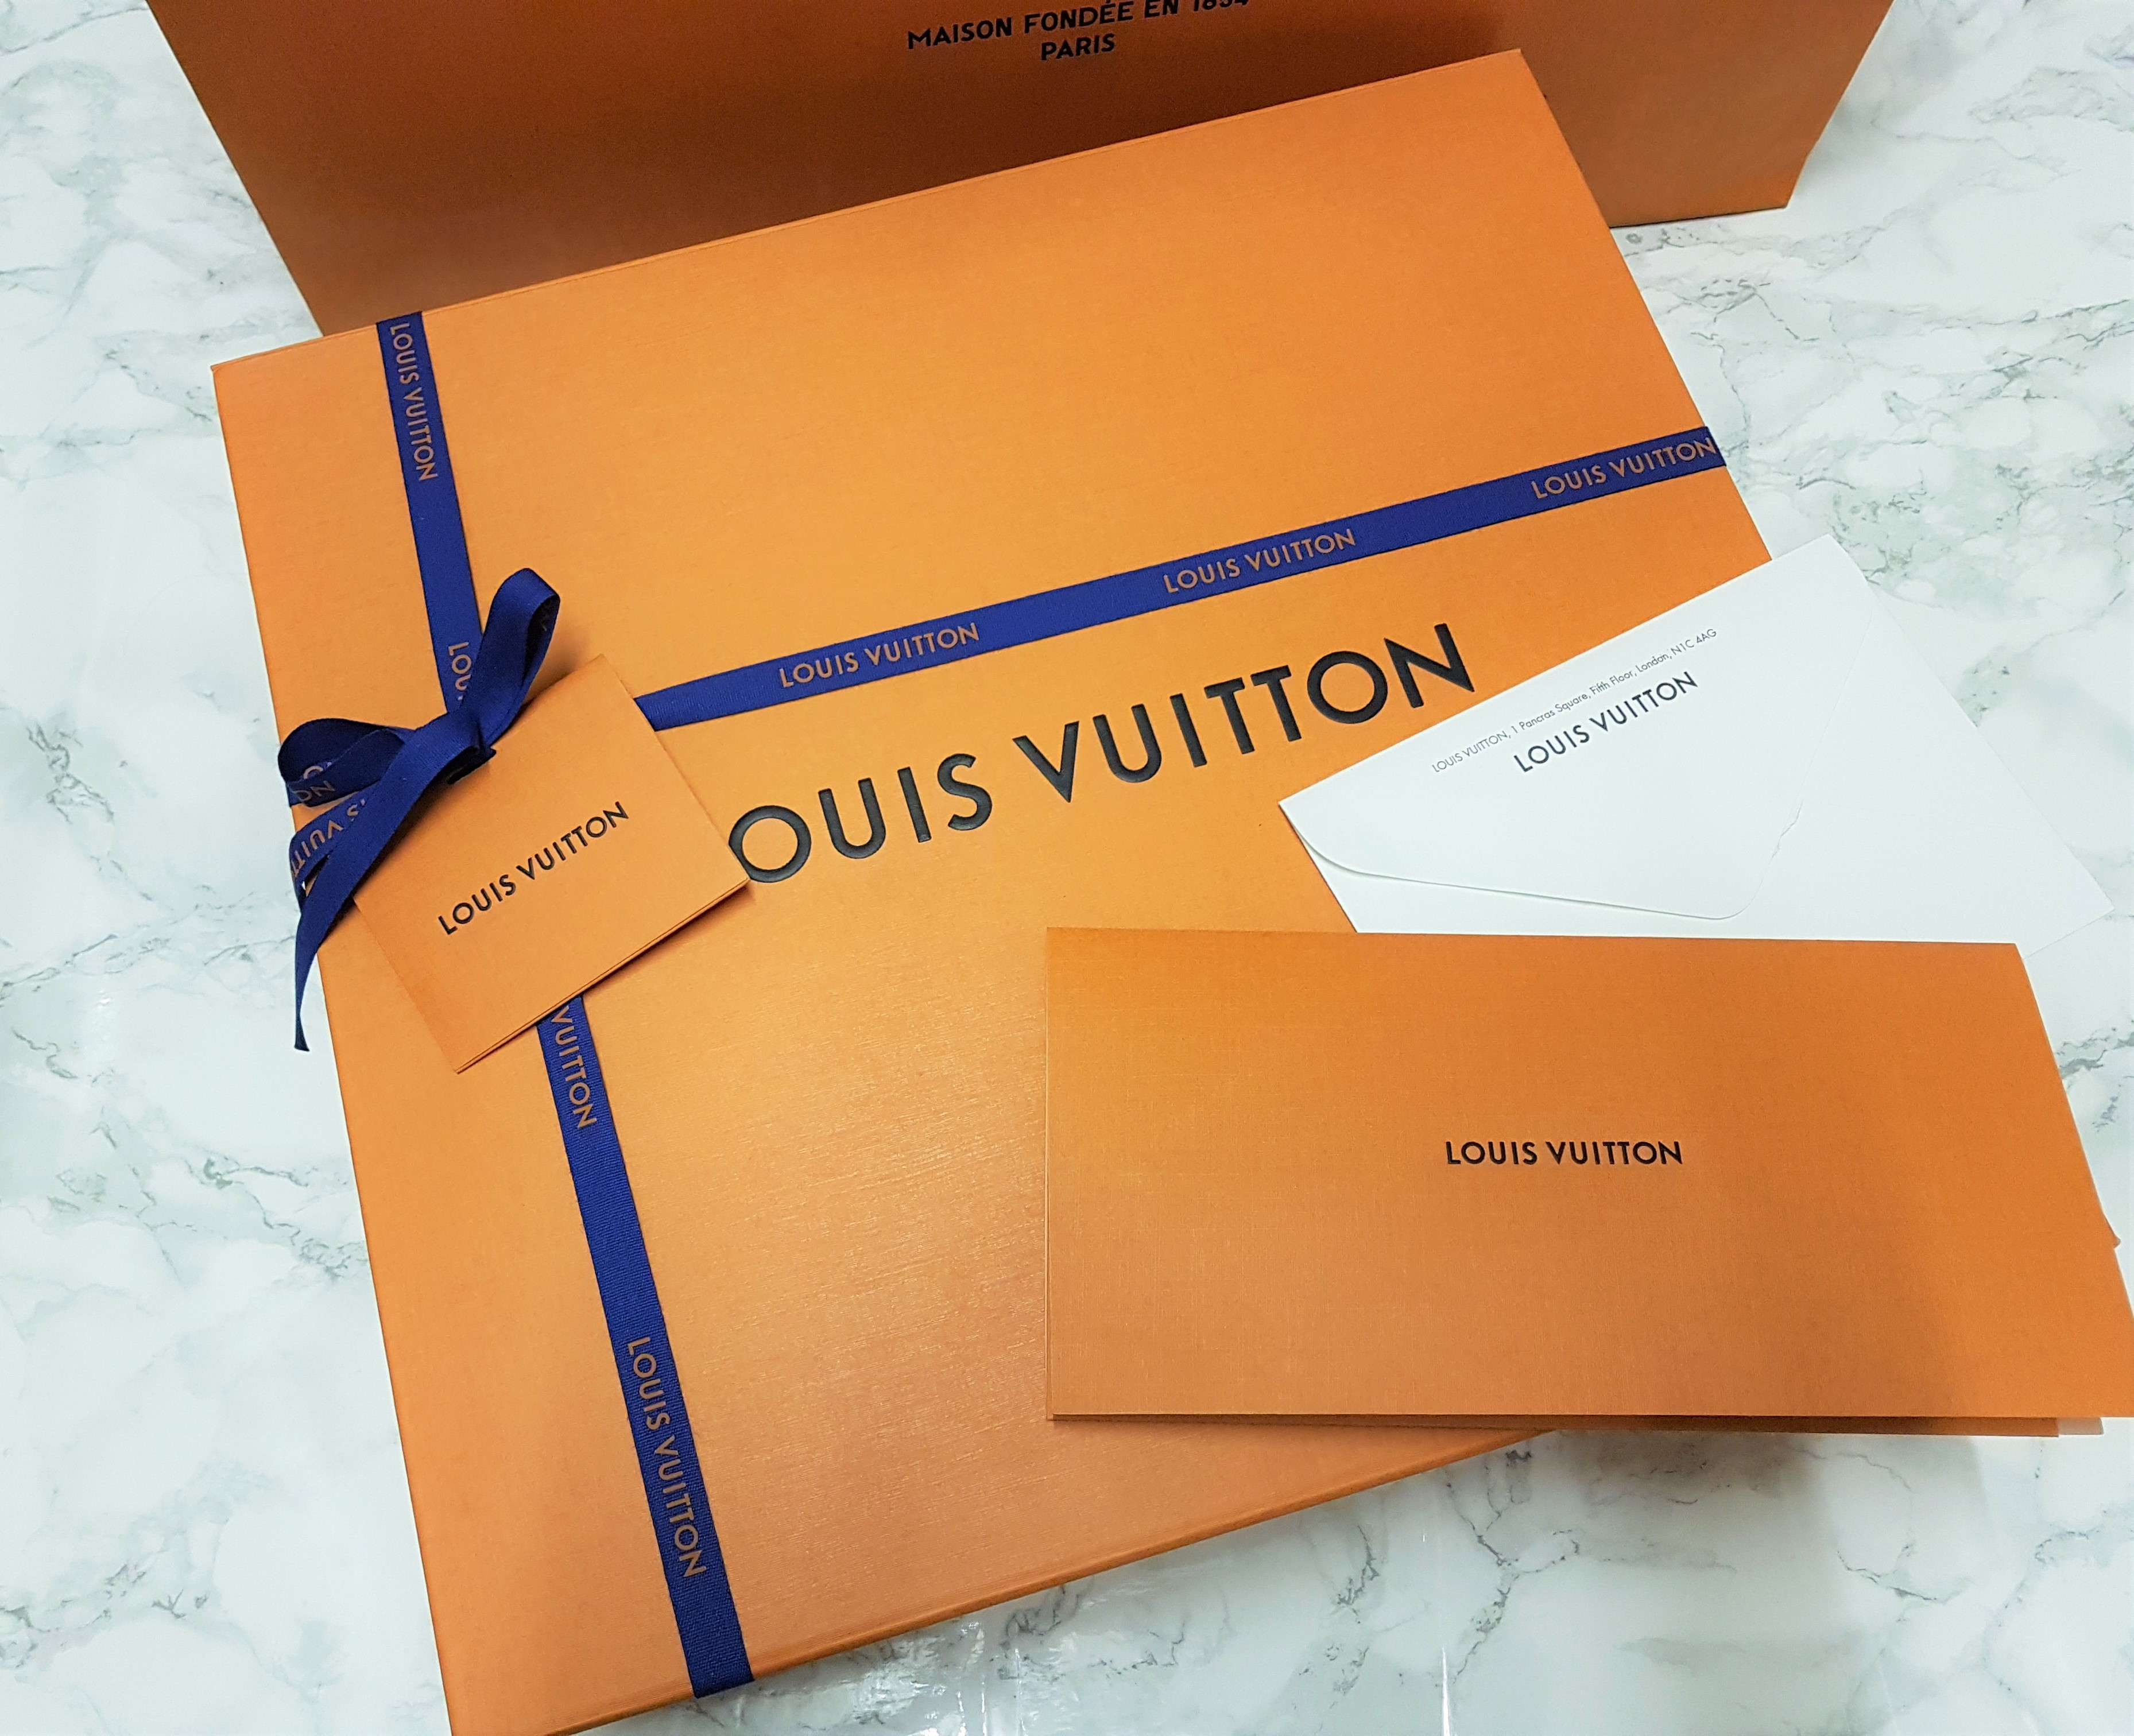 Louis Vuitton Speedy Bandouliere 30 Damier Ebene.unboxing